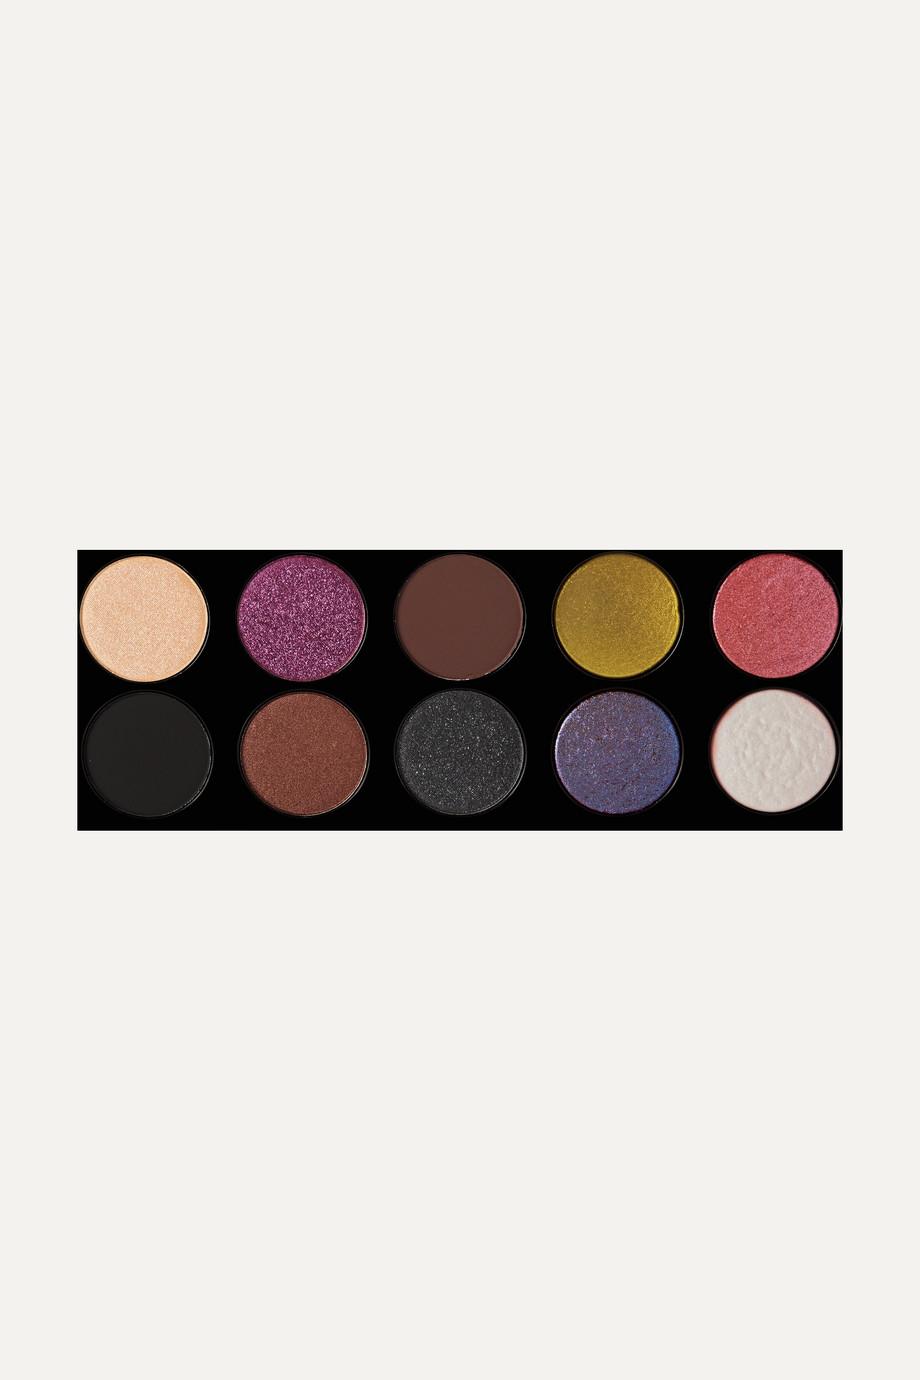 Pat McGrath Labs Mothership III Eyeshadow Palette - Subversive